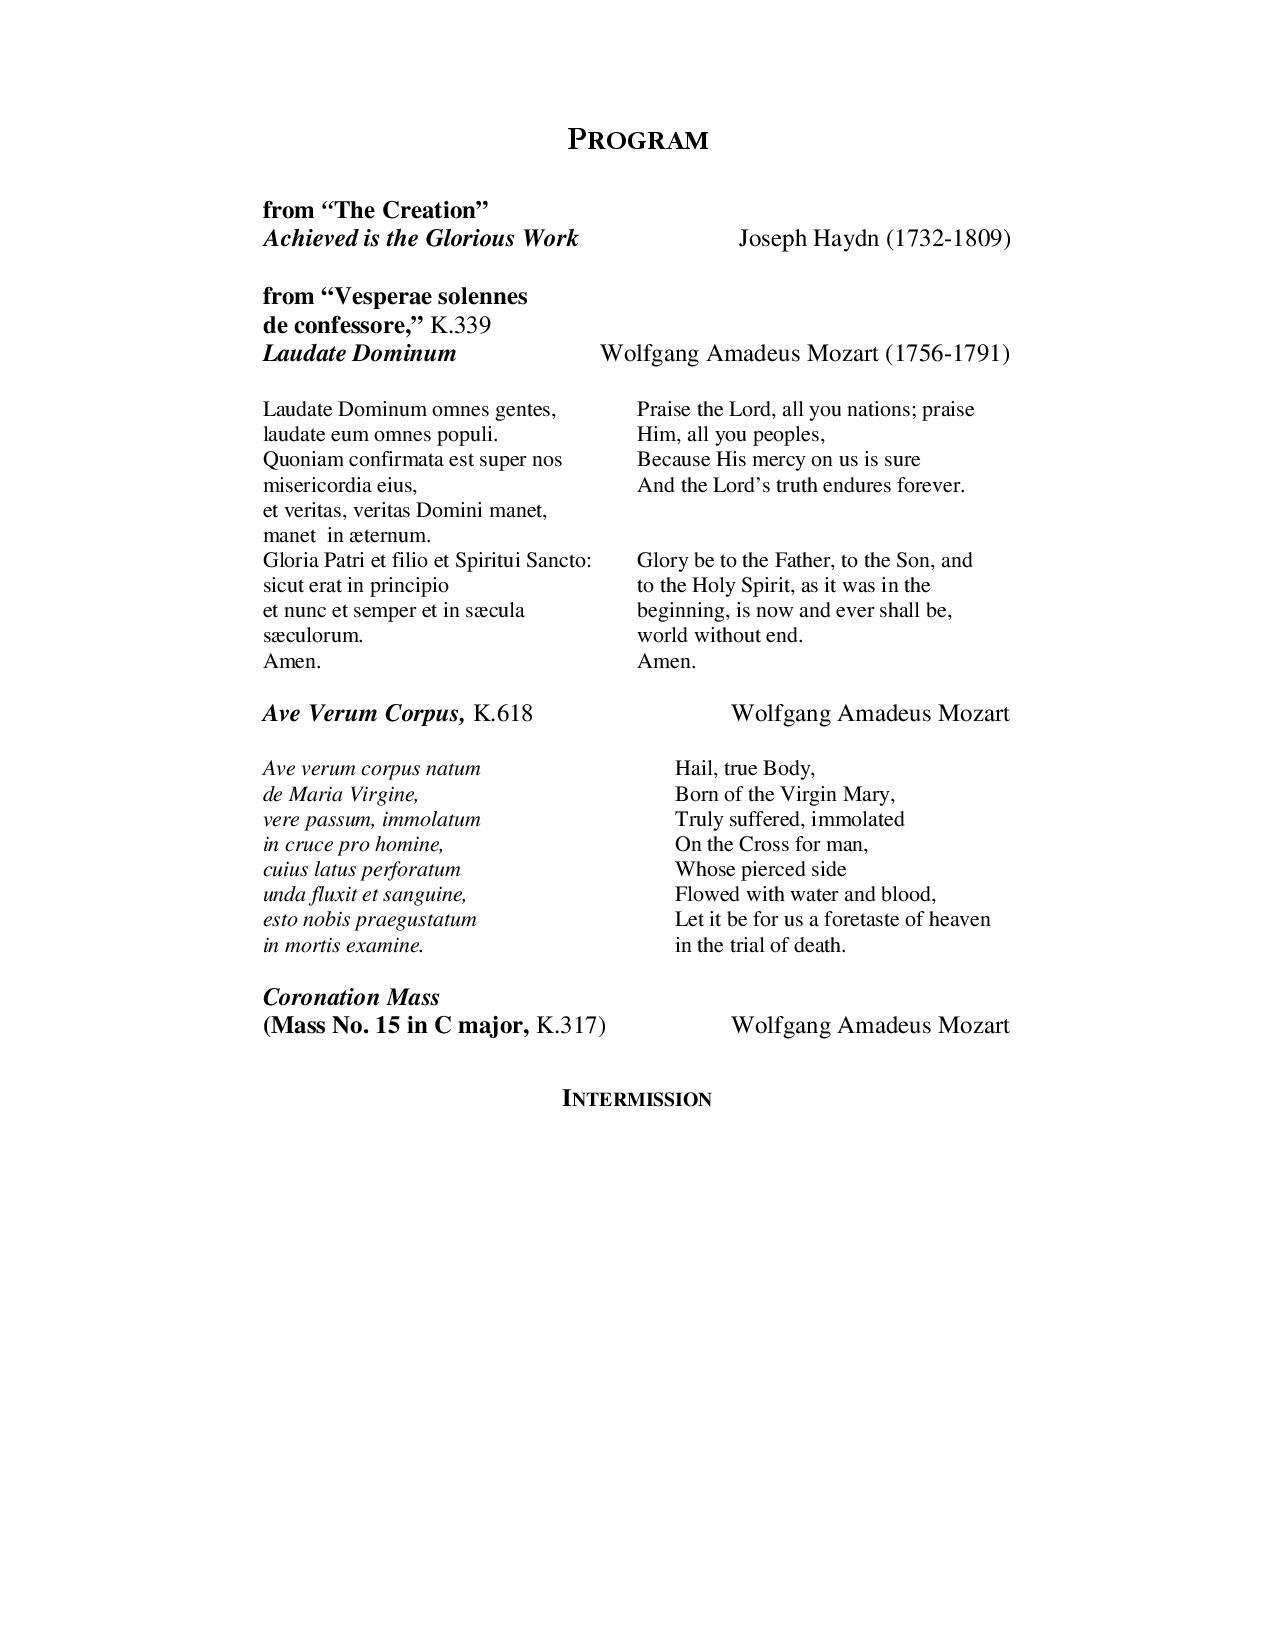 2009-04-26 - Program for Printing-page-003.jpg